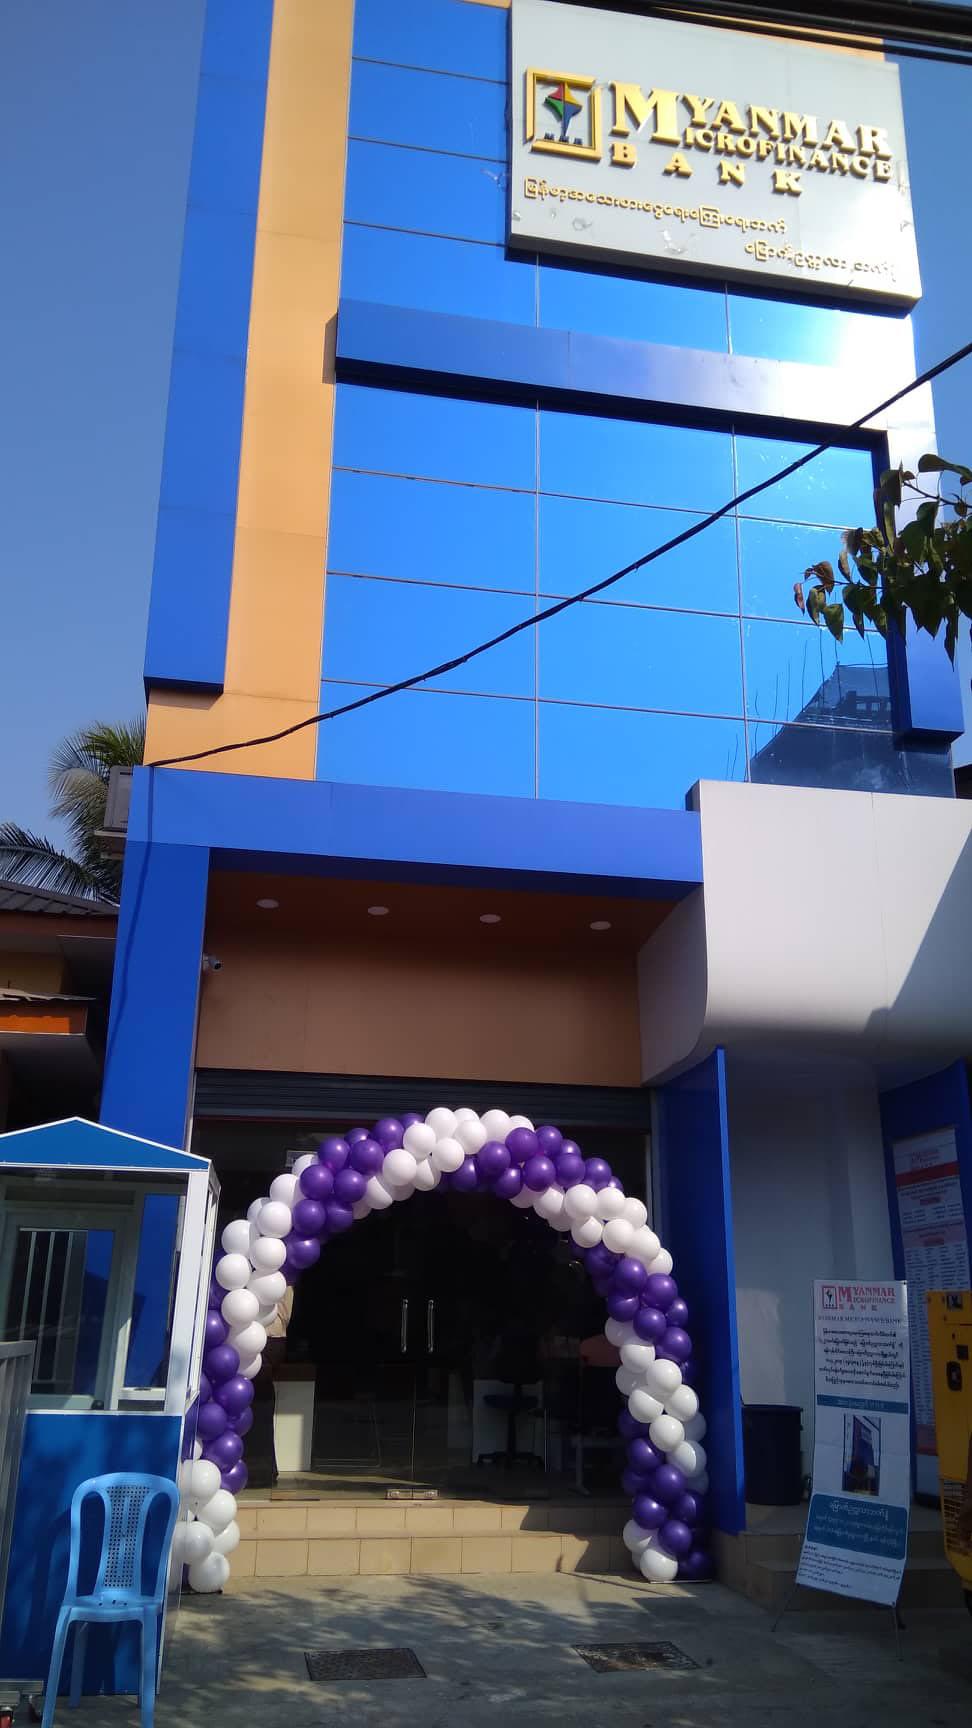 Myanmar Microfinance Bank Ltd. North Okkala Branch